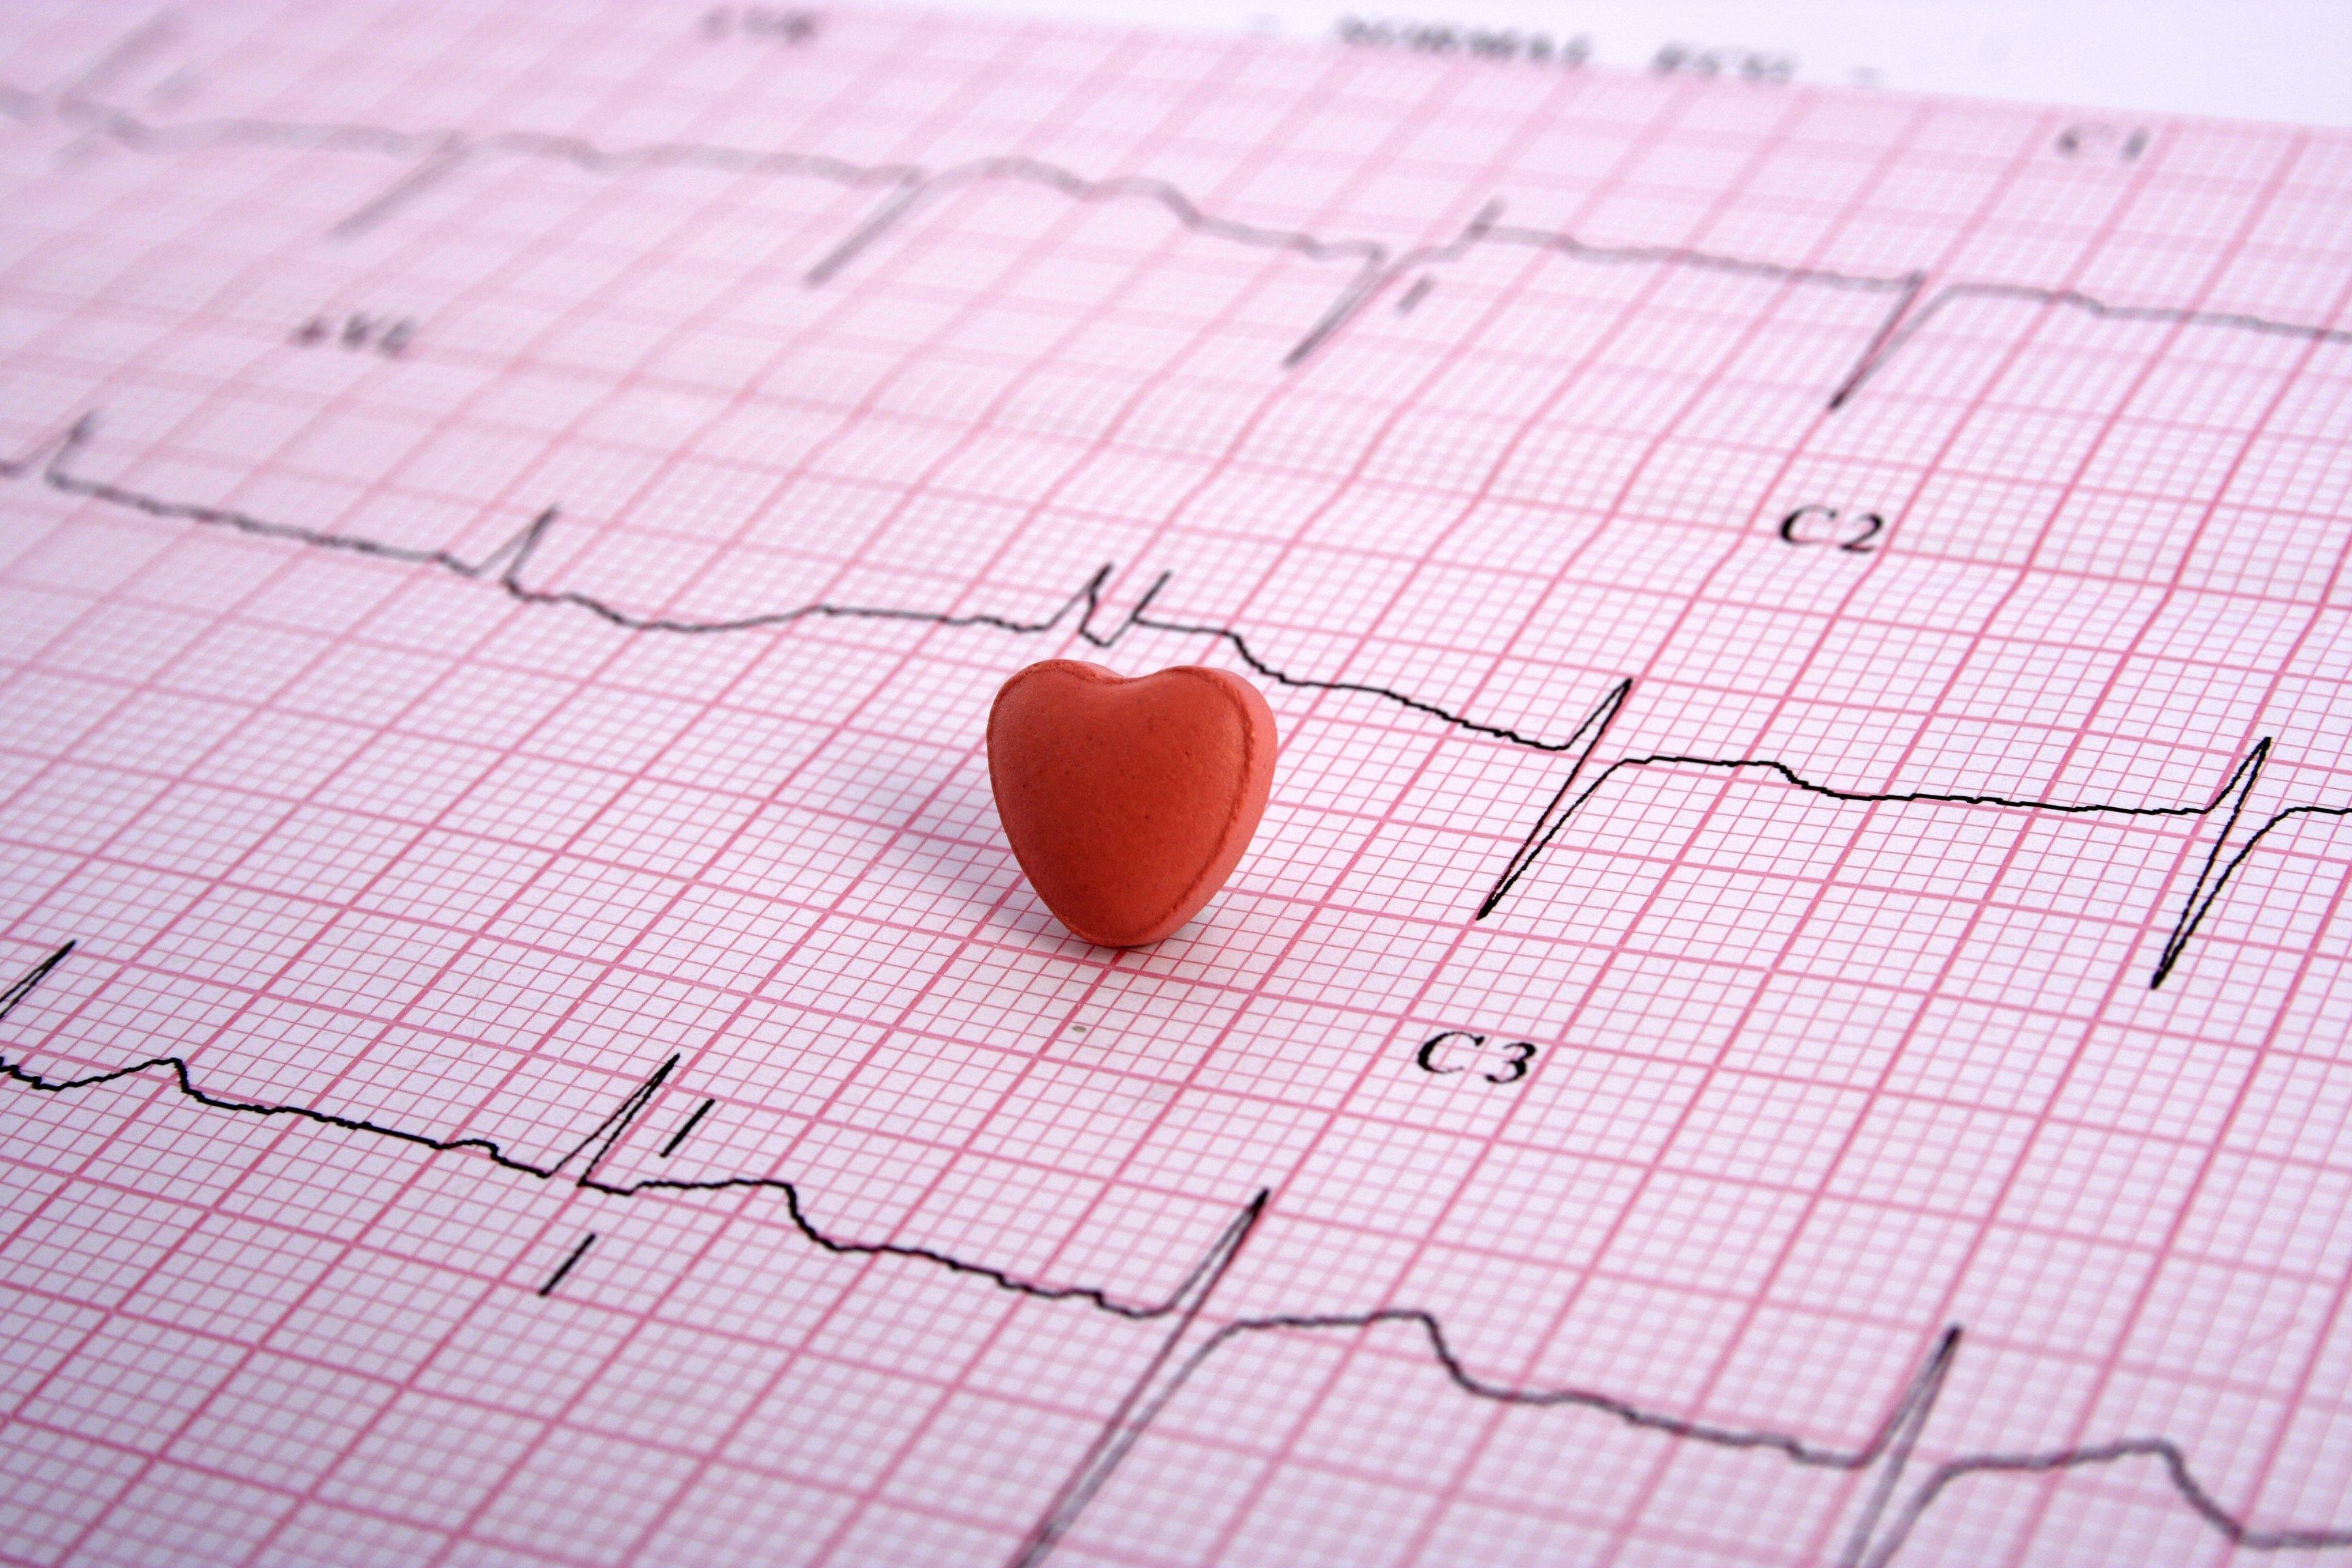 EKG Service In Cleveland, TN